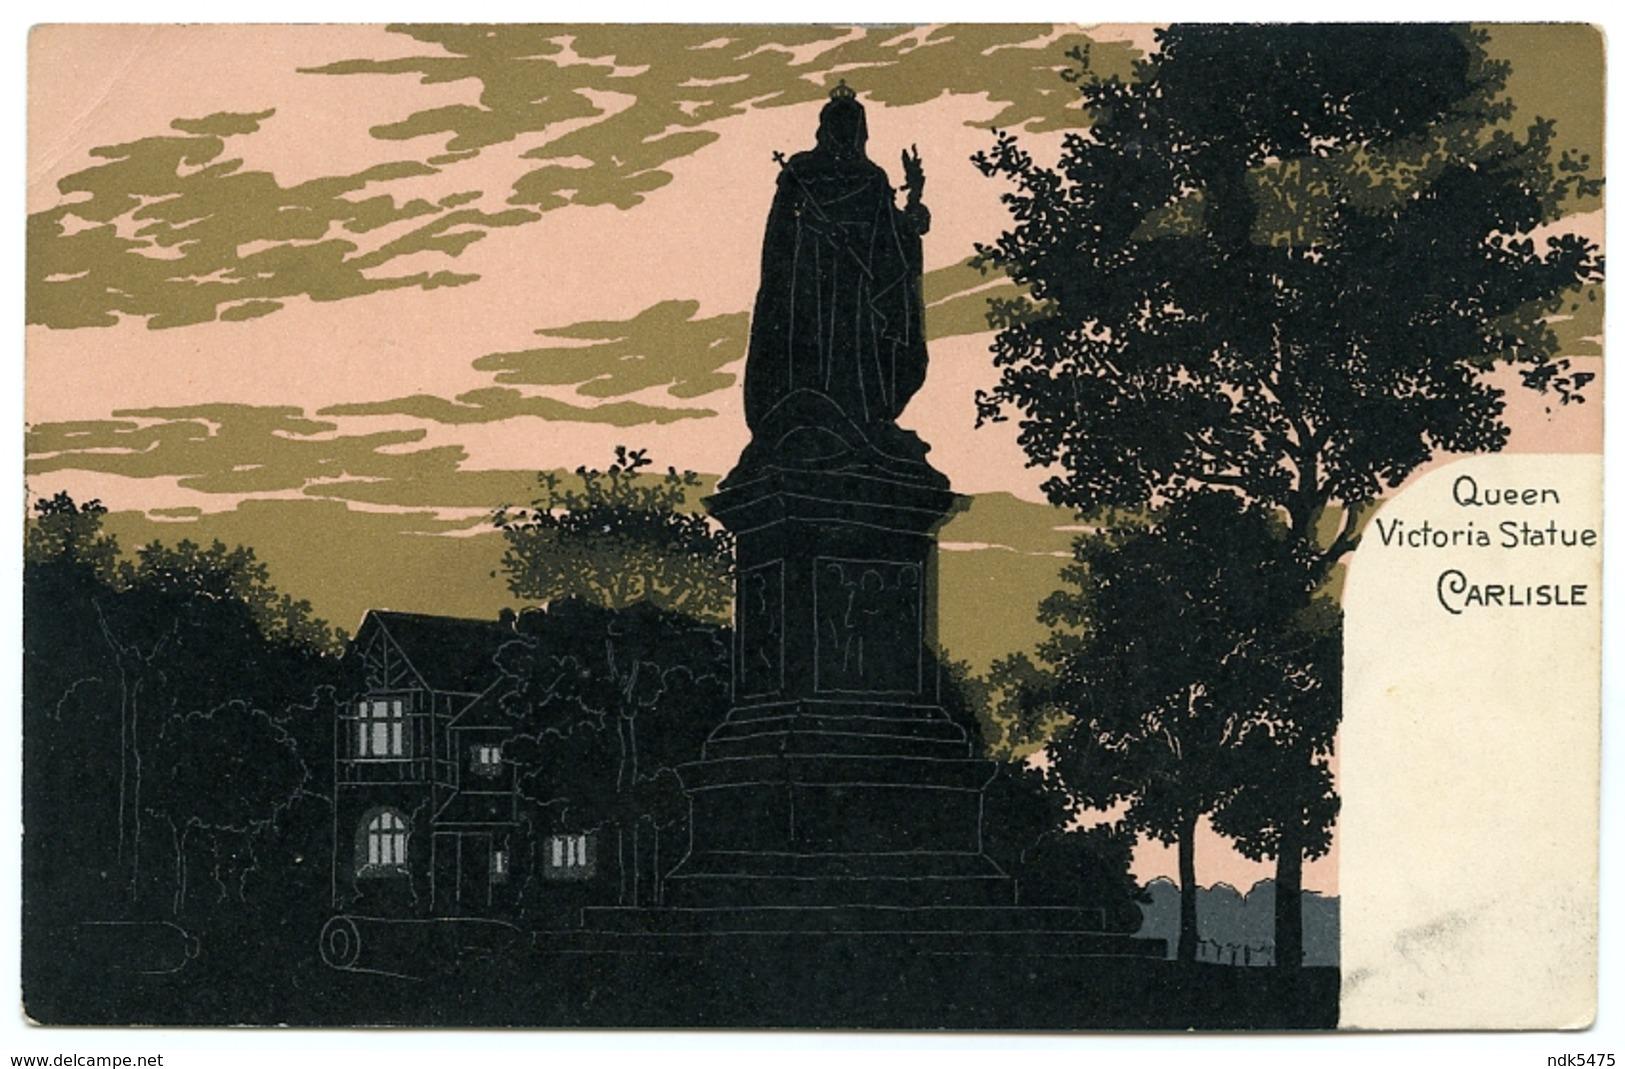 LAKE DISTRICT : CARLISLE - QUEEN VICTORIA STATUE (SILHOUETTE - ARTIST CARD) - Cumberland/ Westmorland